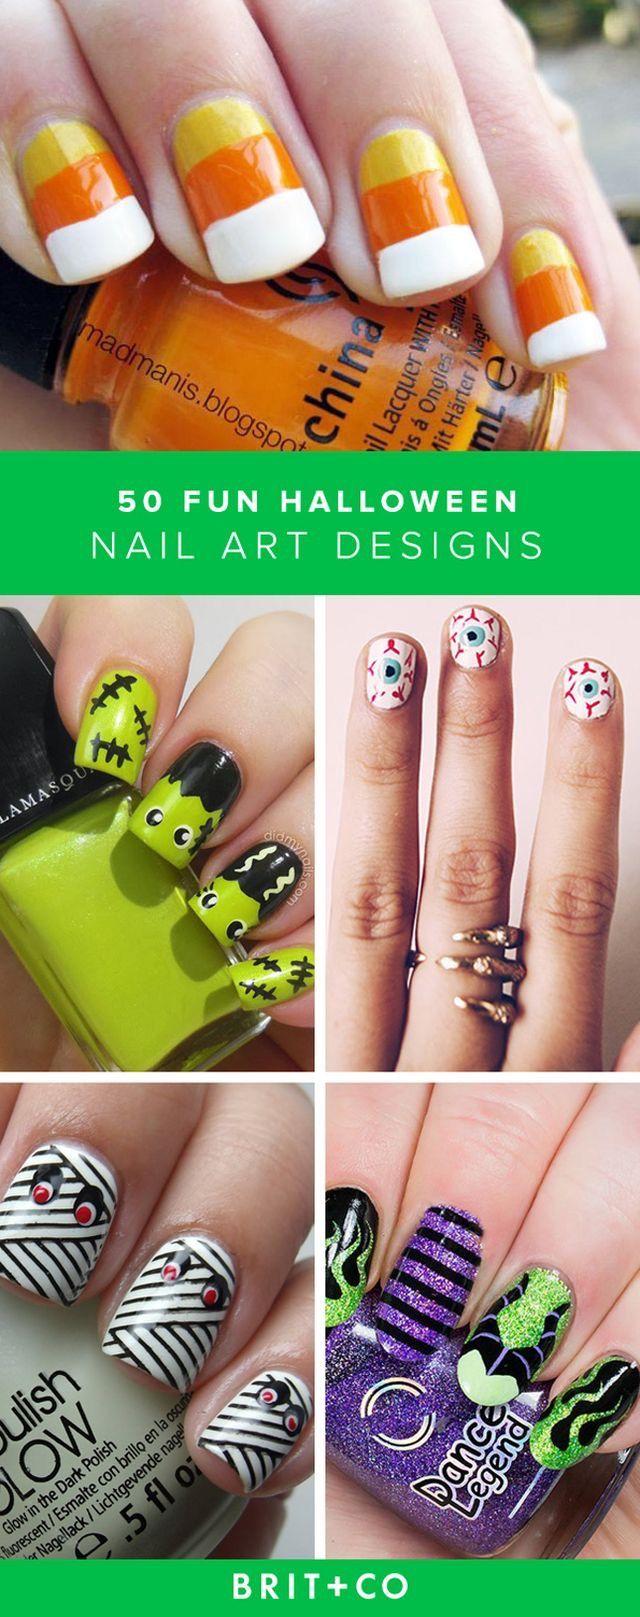 Pin de Aimee Weckmann en nails | Pinterest